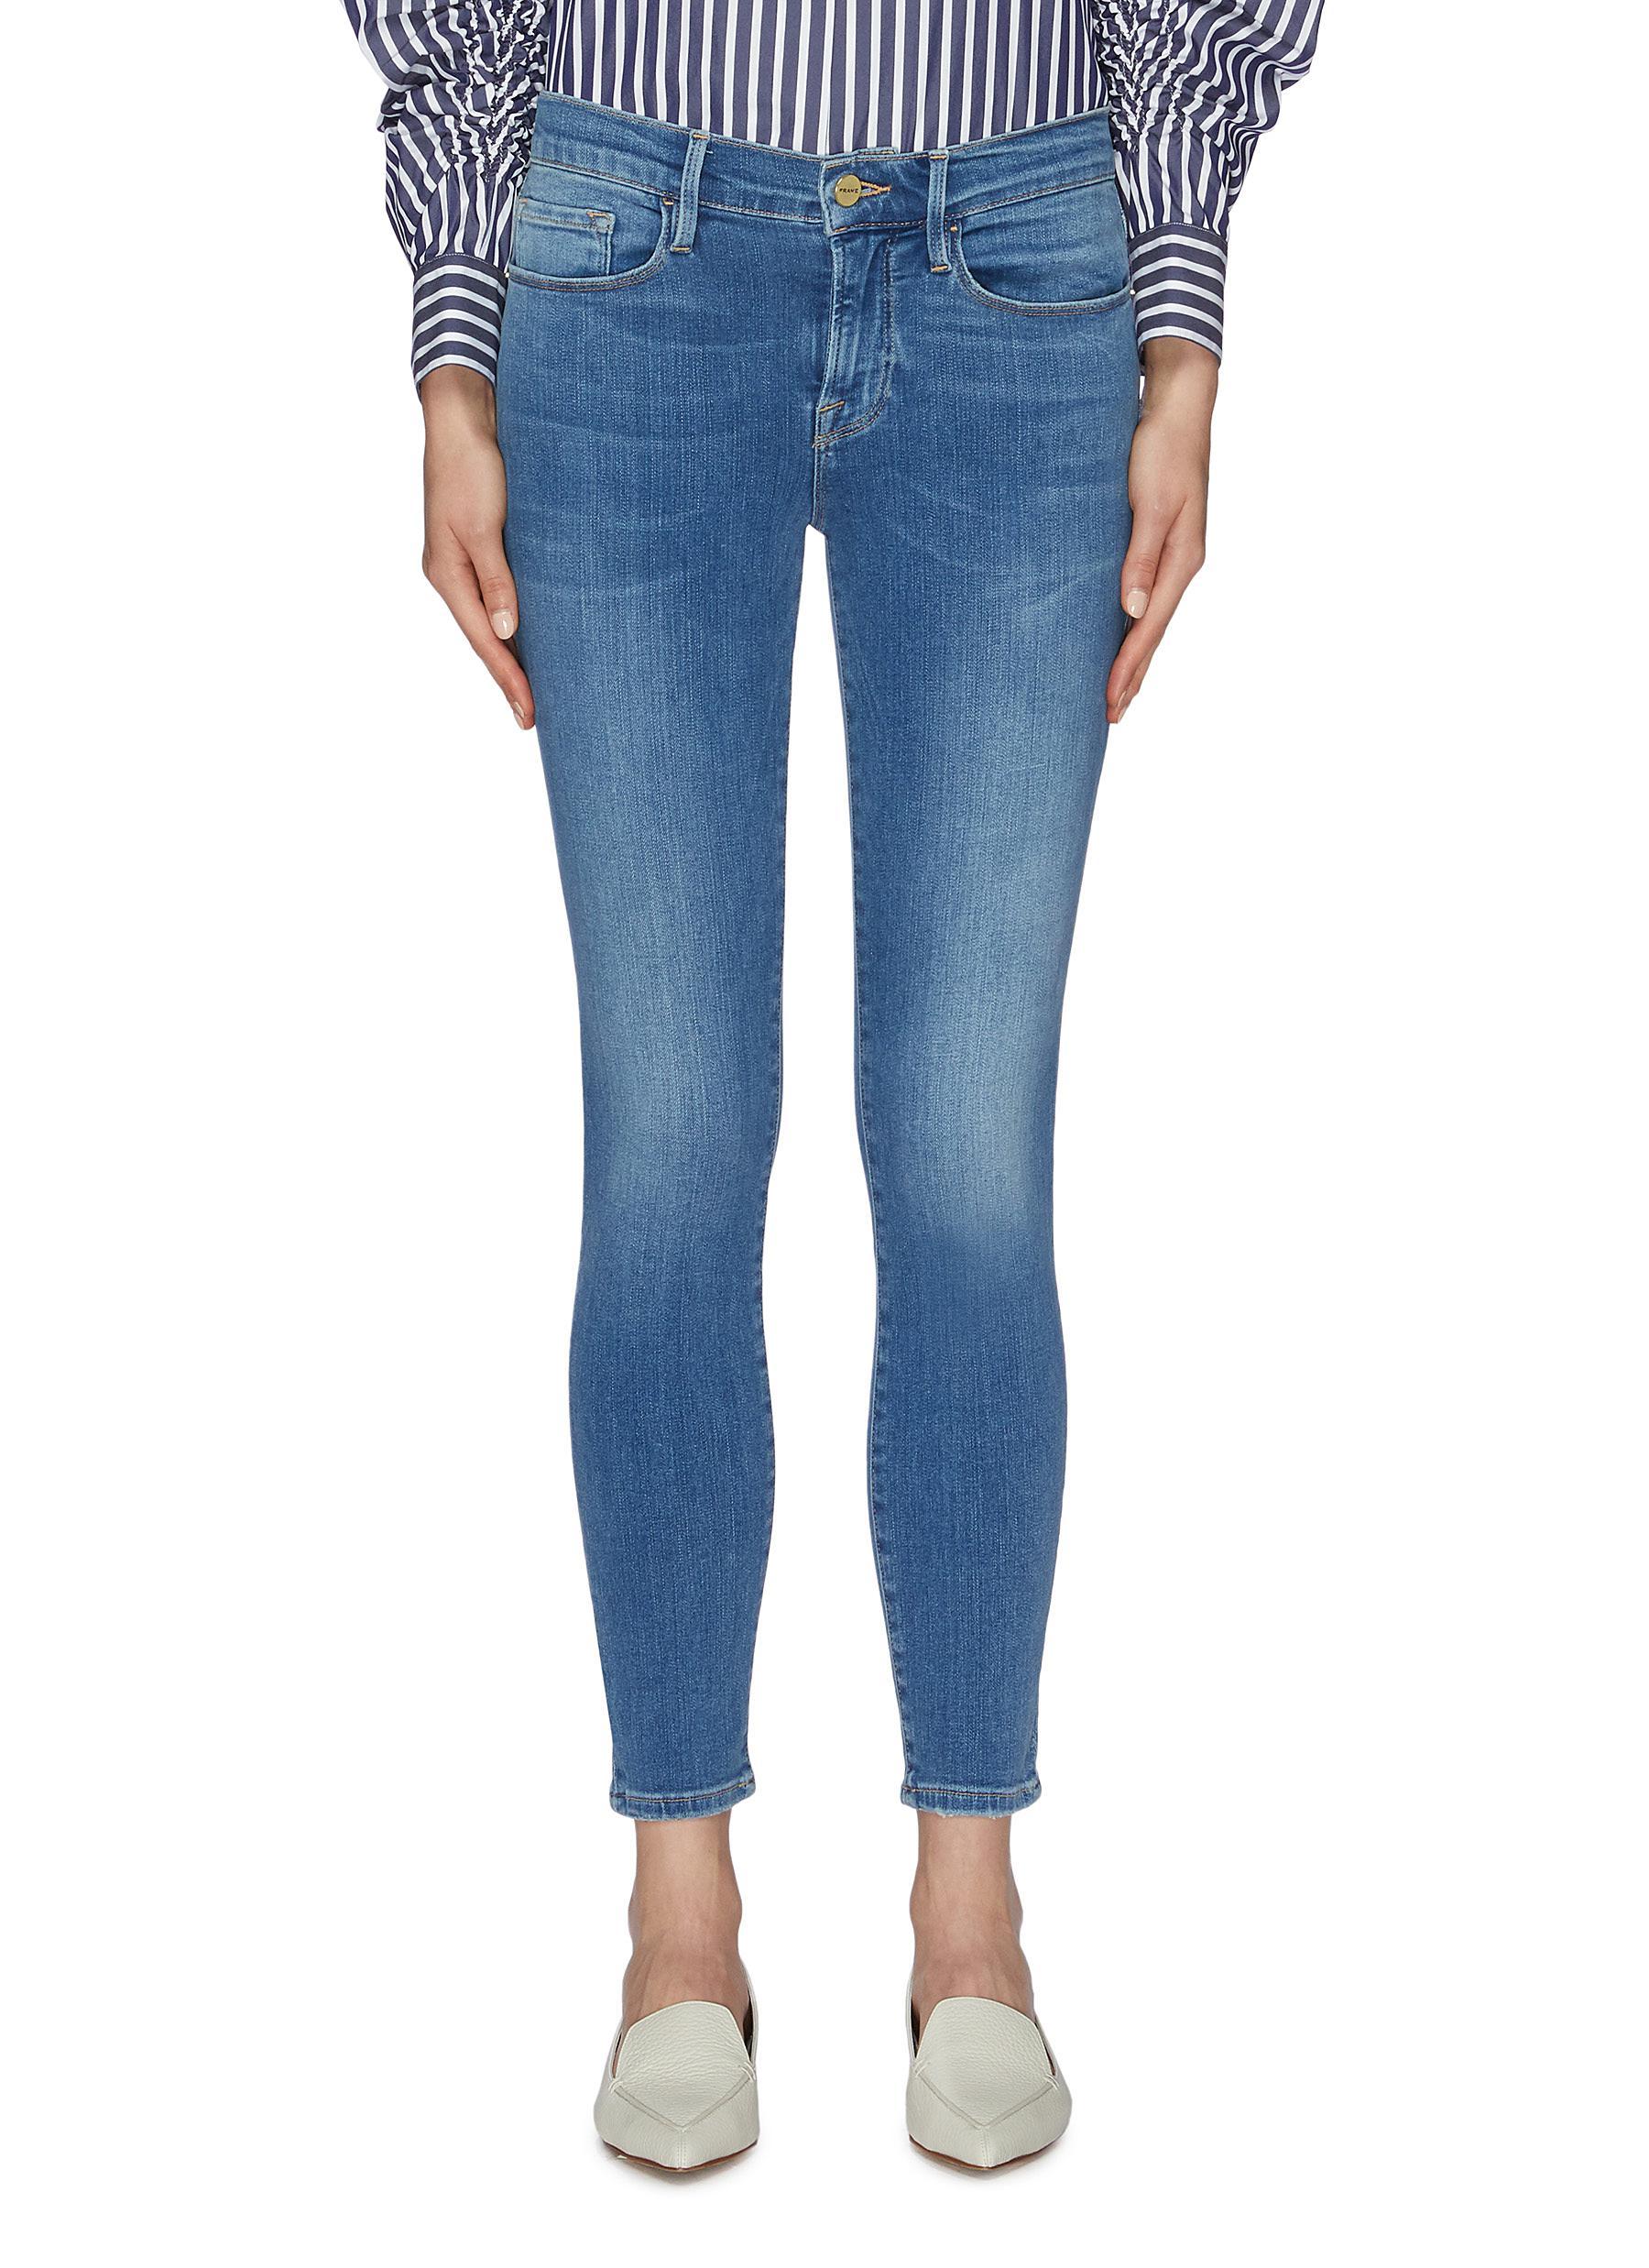 Le Skinny De Jeanne cropped jeans by Frame Denim